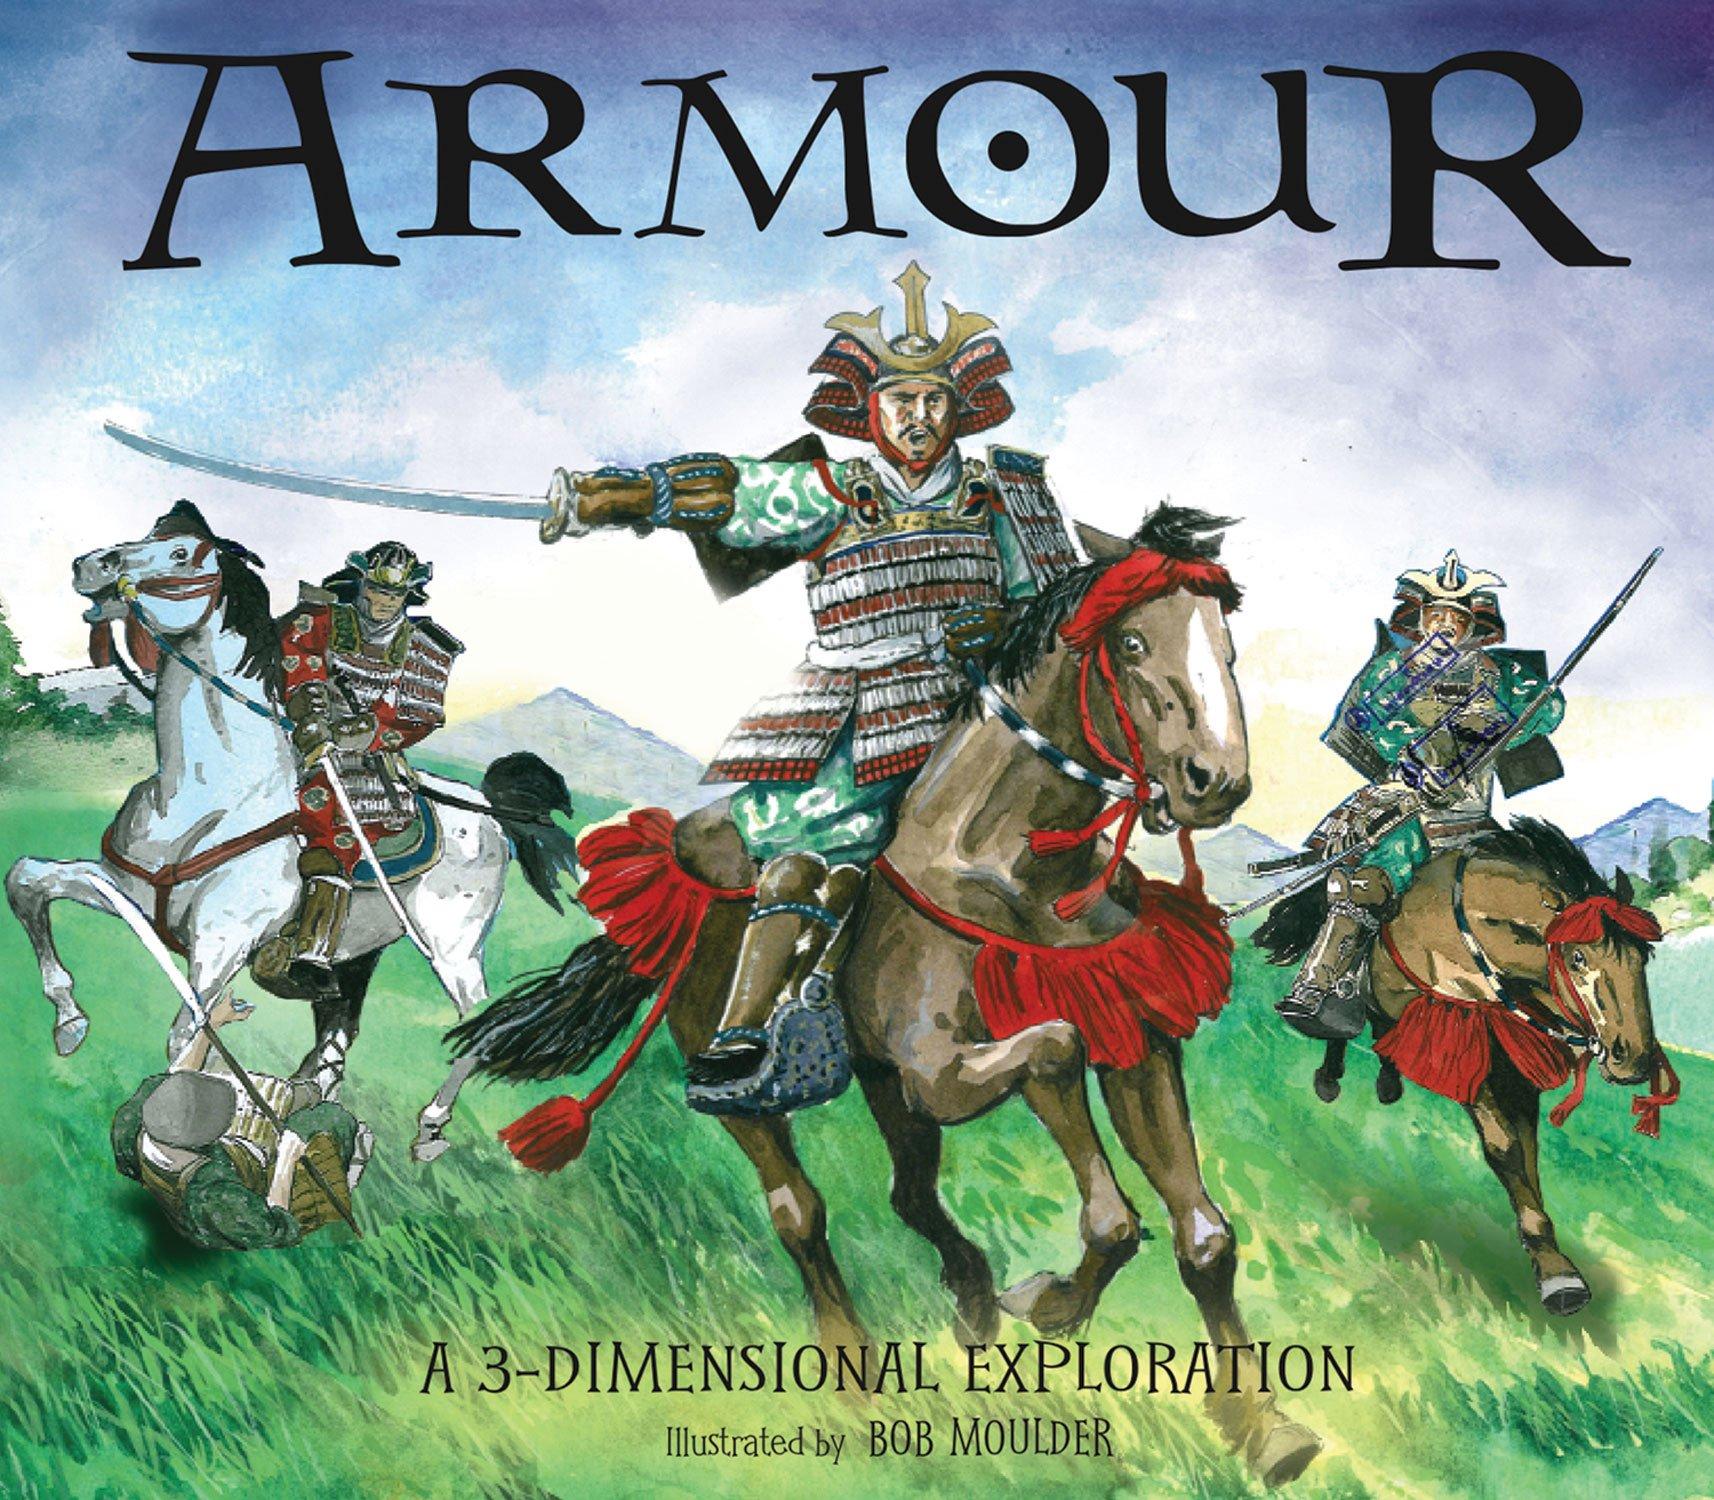 Armour: A 3-Dimensional Exploration (3-Dimensional Exploration Books)